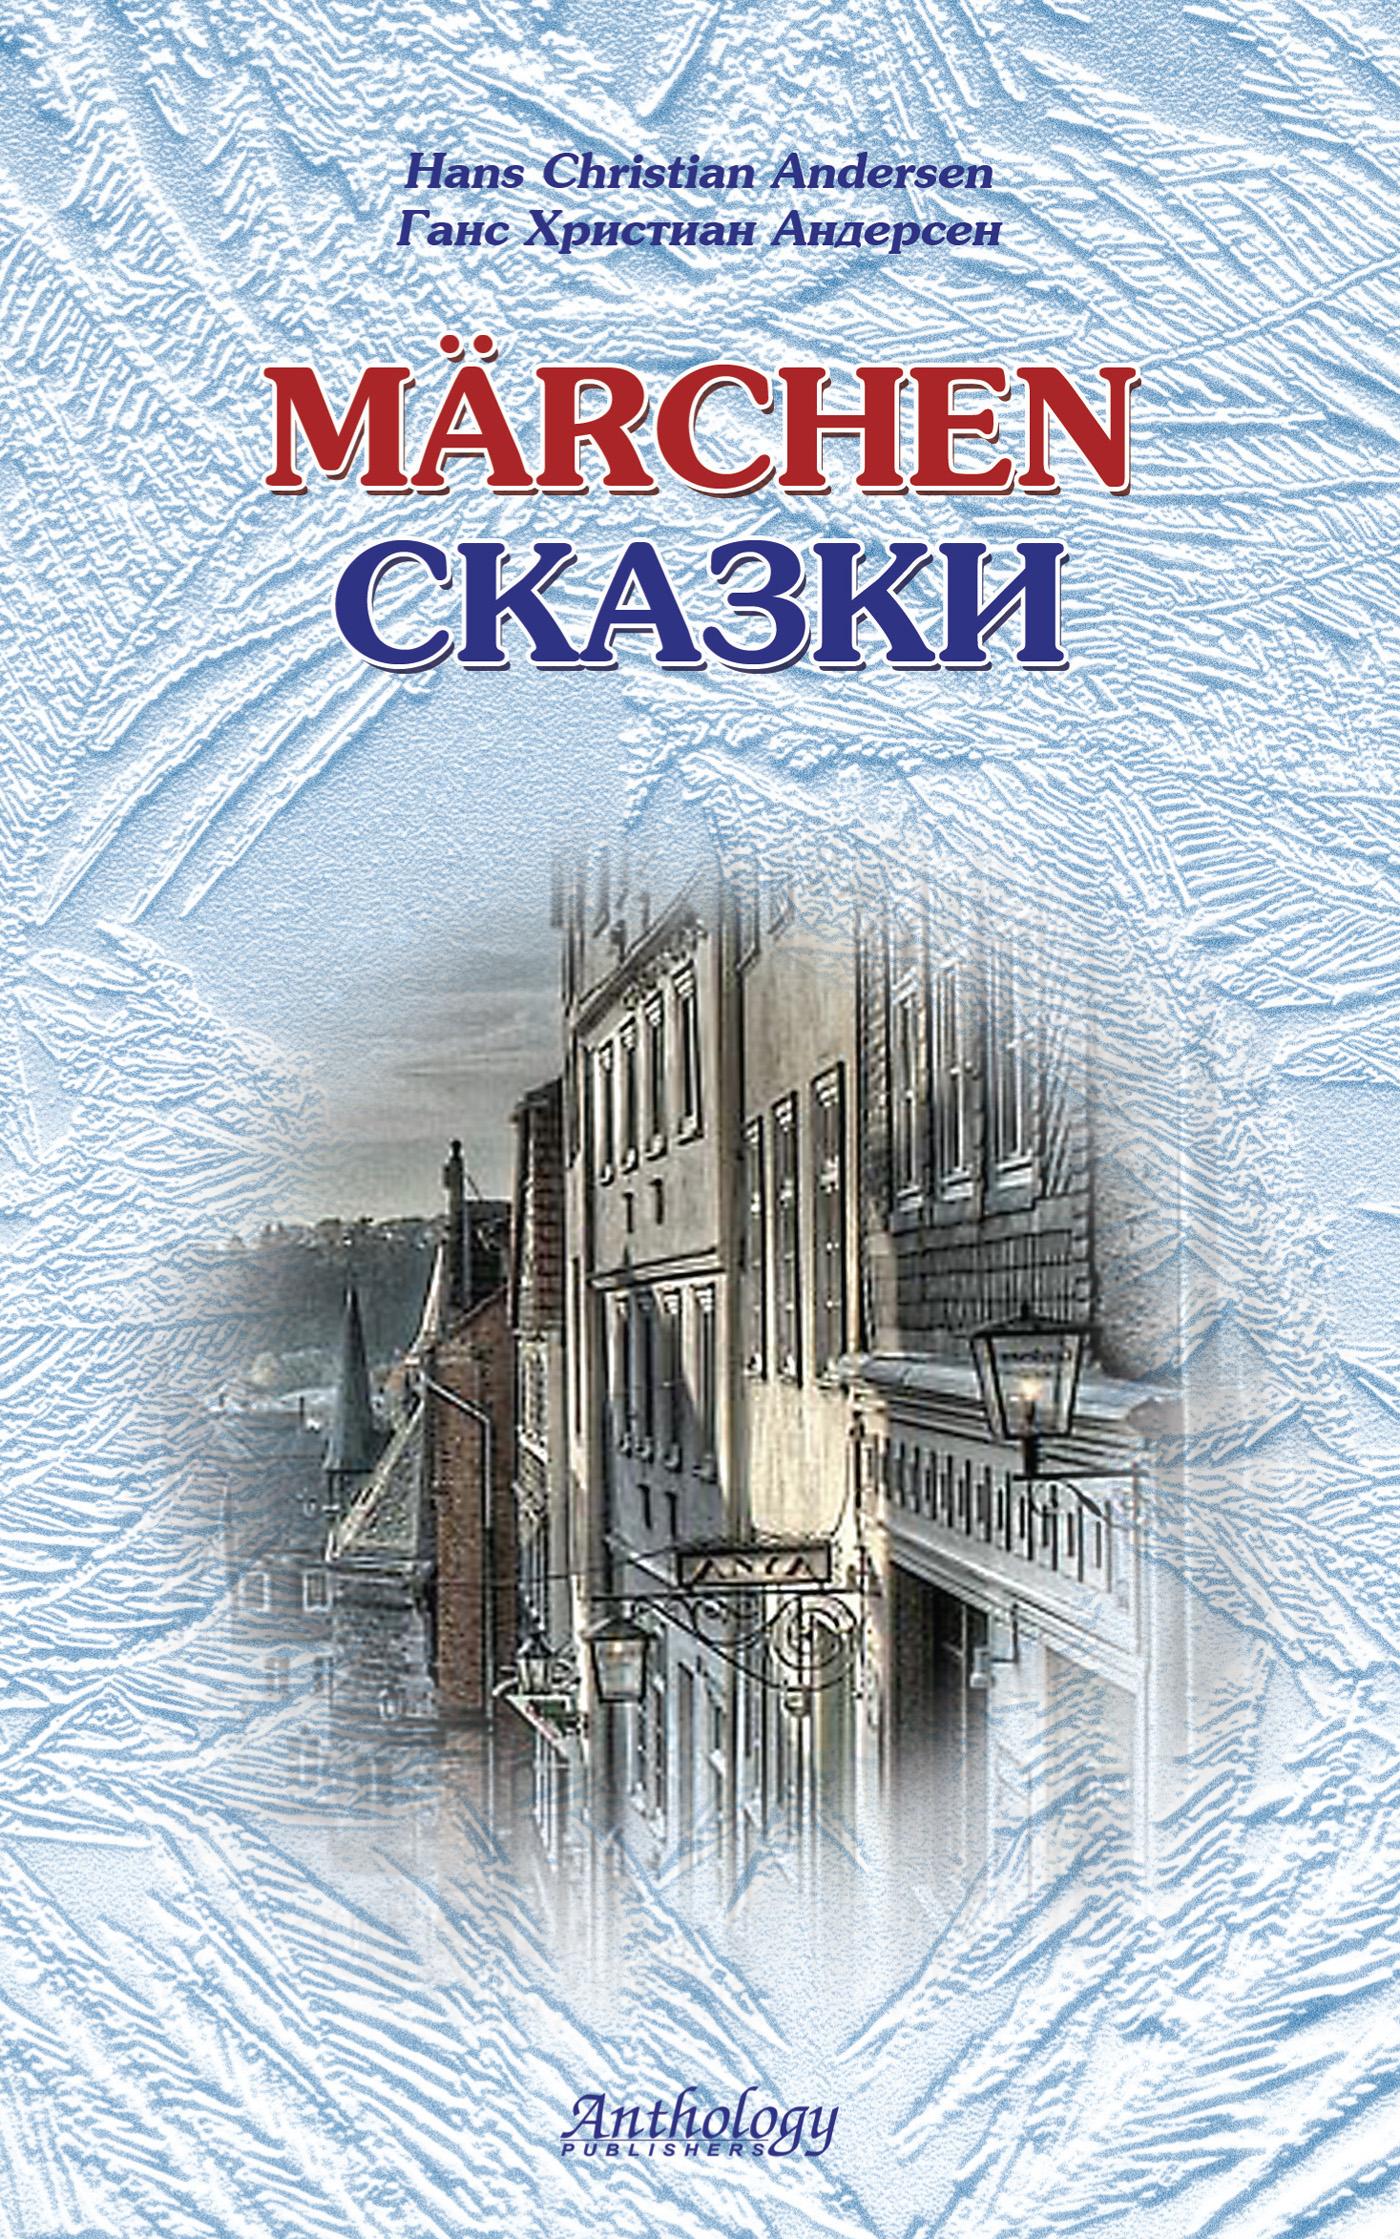 Ганс Христиан Андерсен Marchen / Сказки clemens brentano marchen